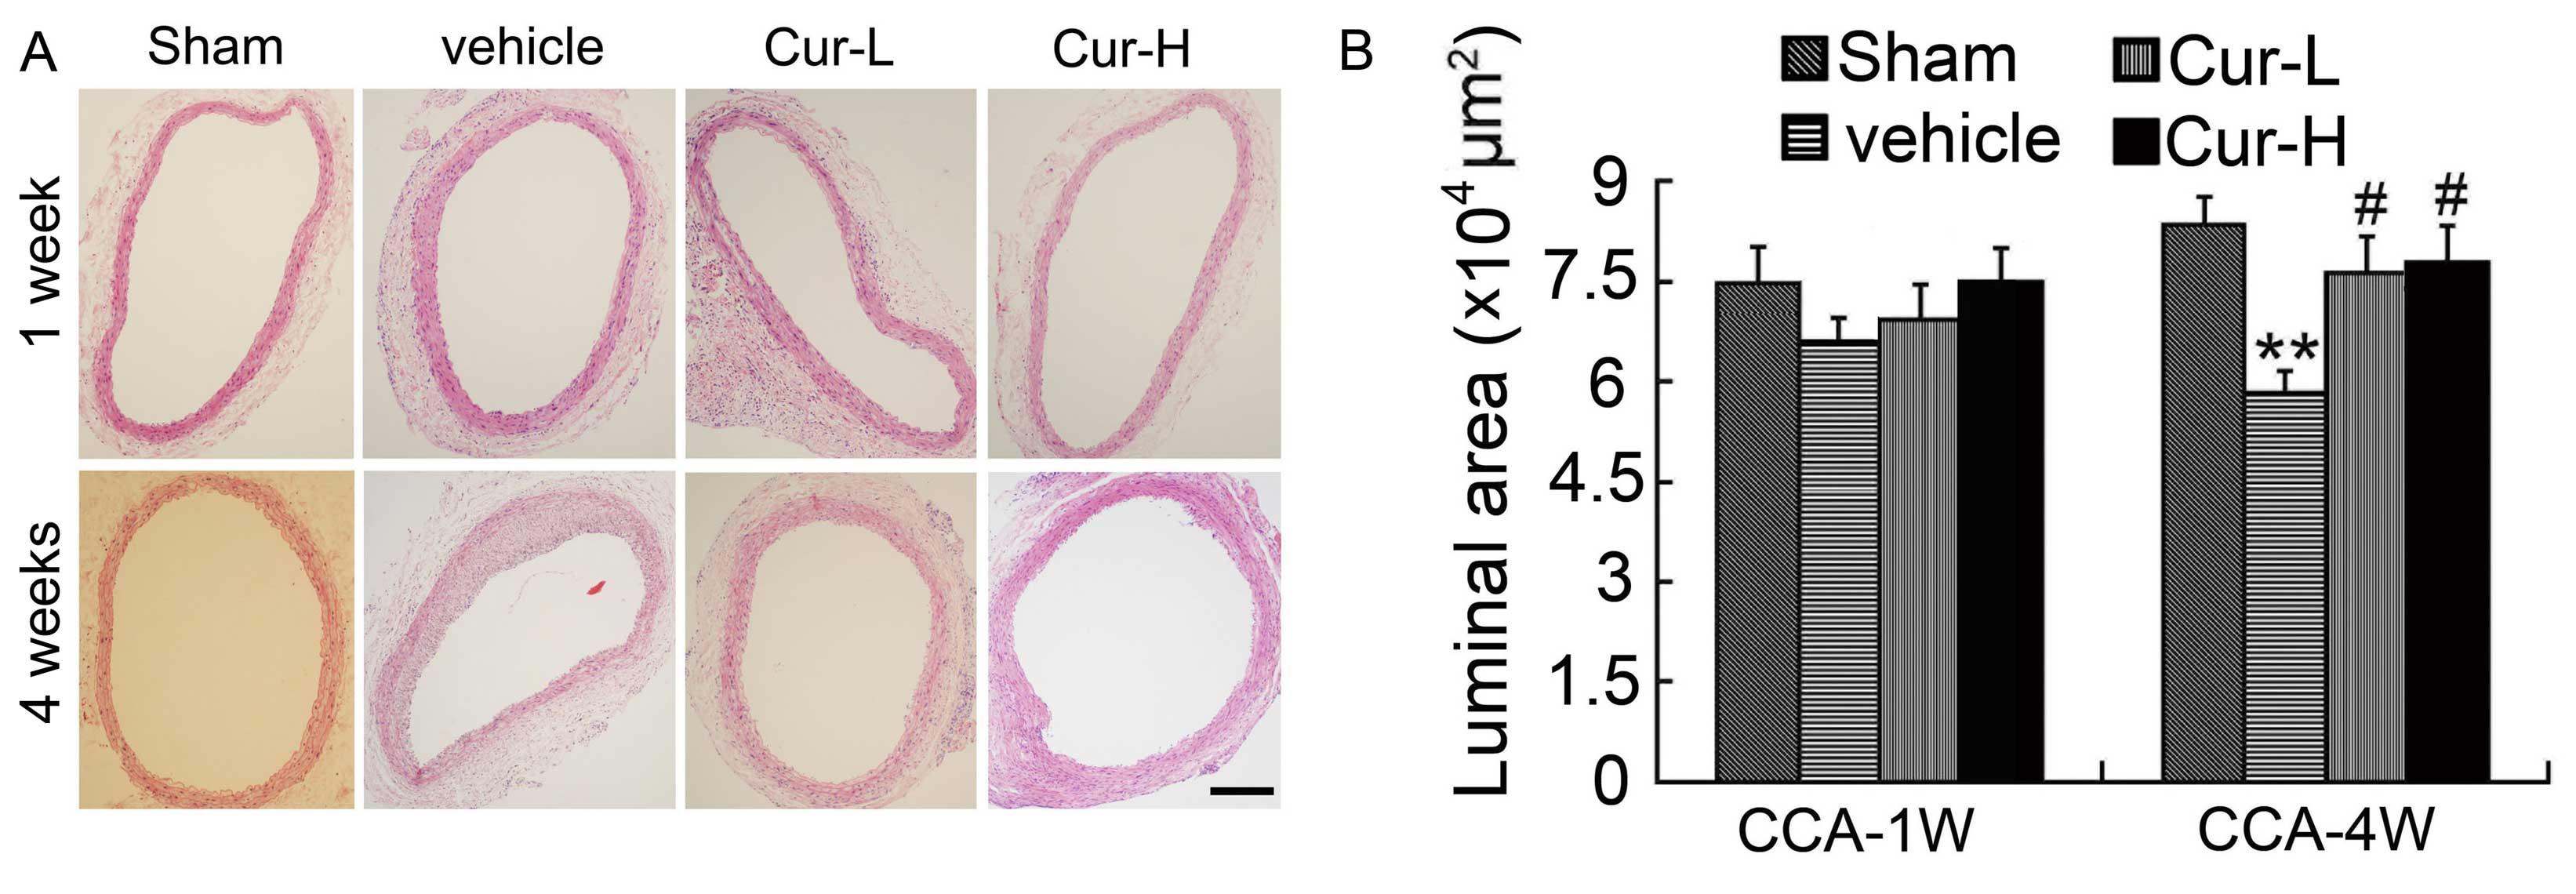 Curcumin accelerates reendothelialization and ameliorates intimal